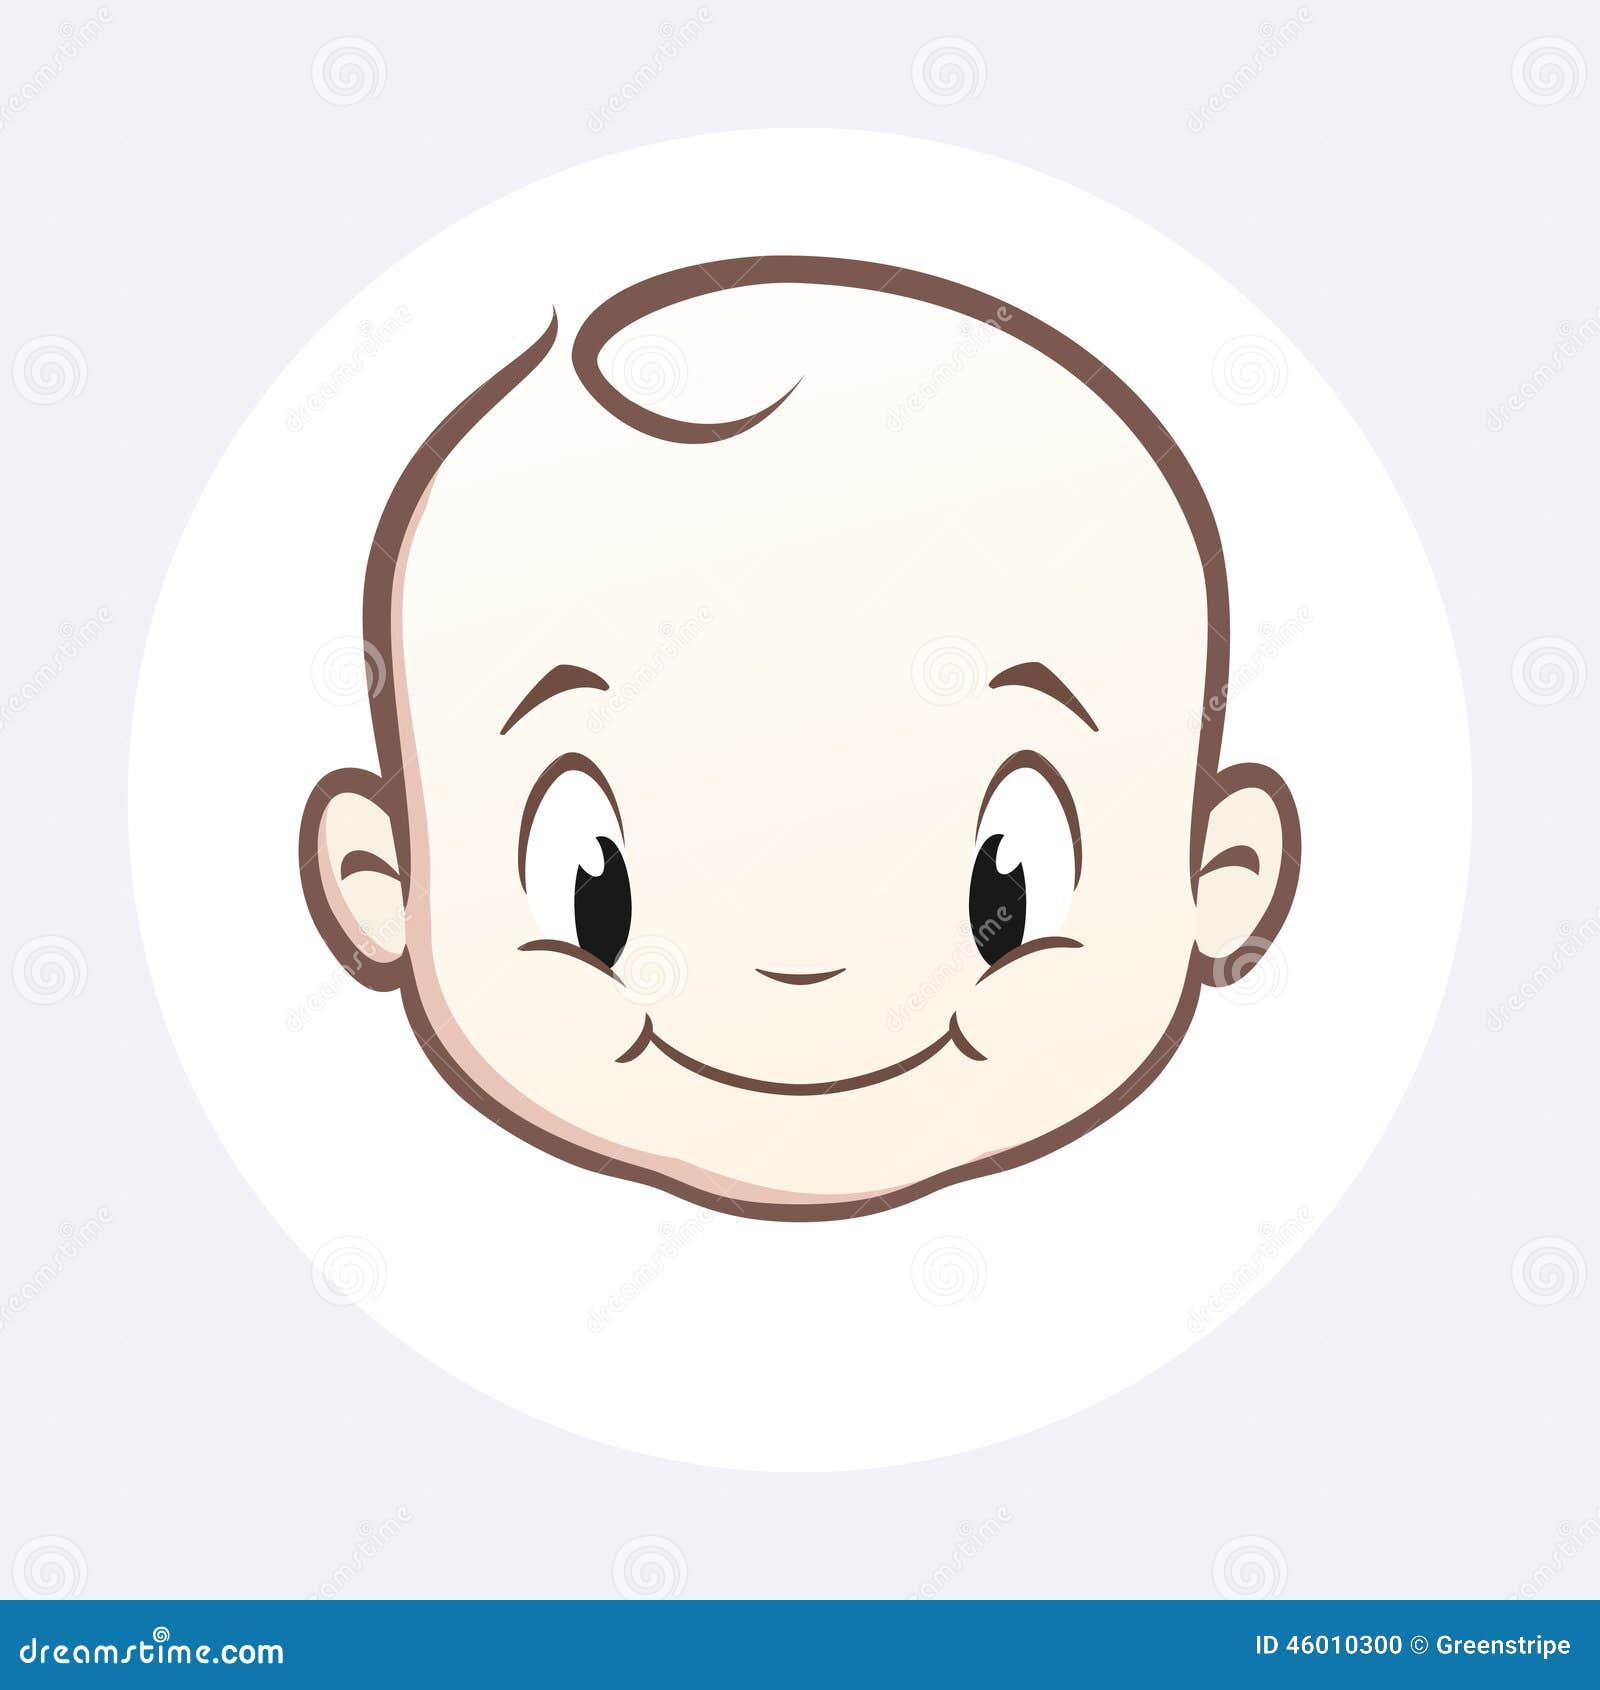 Cartoon Baby Face Stock Vector - Image: 46010300